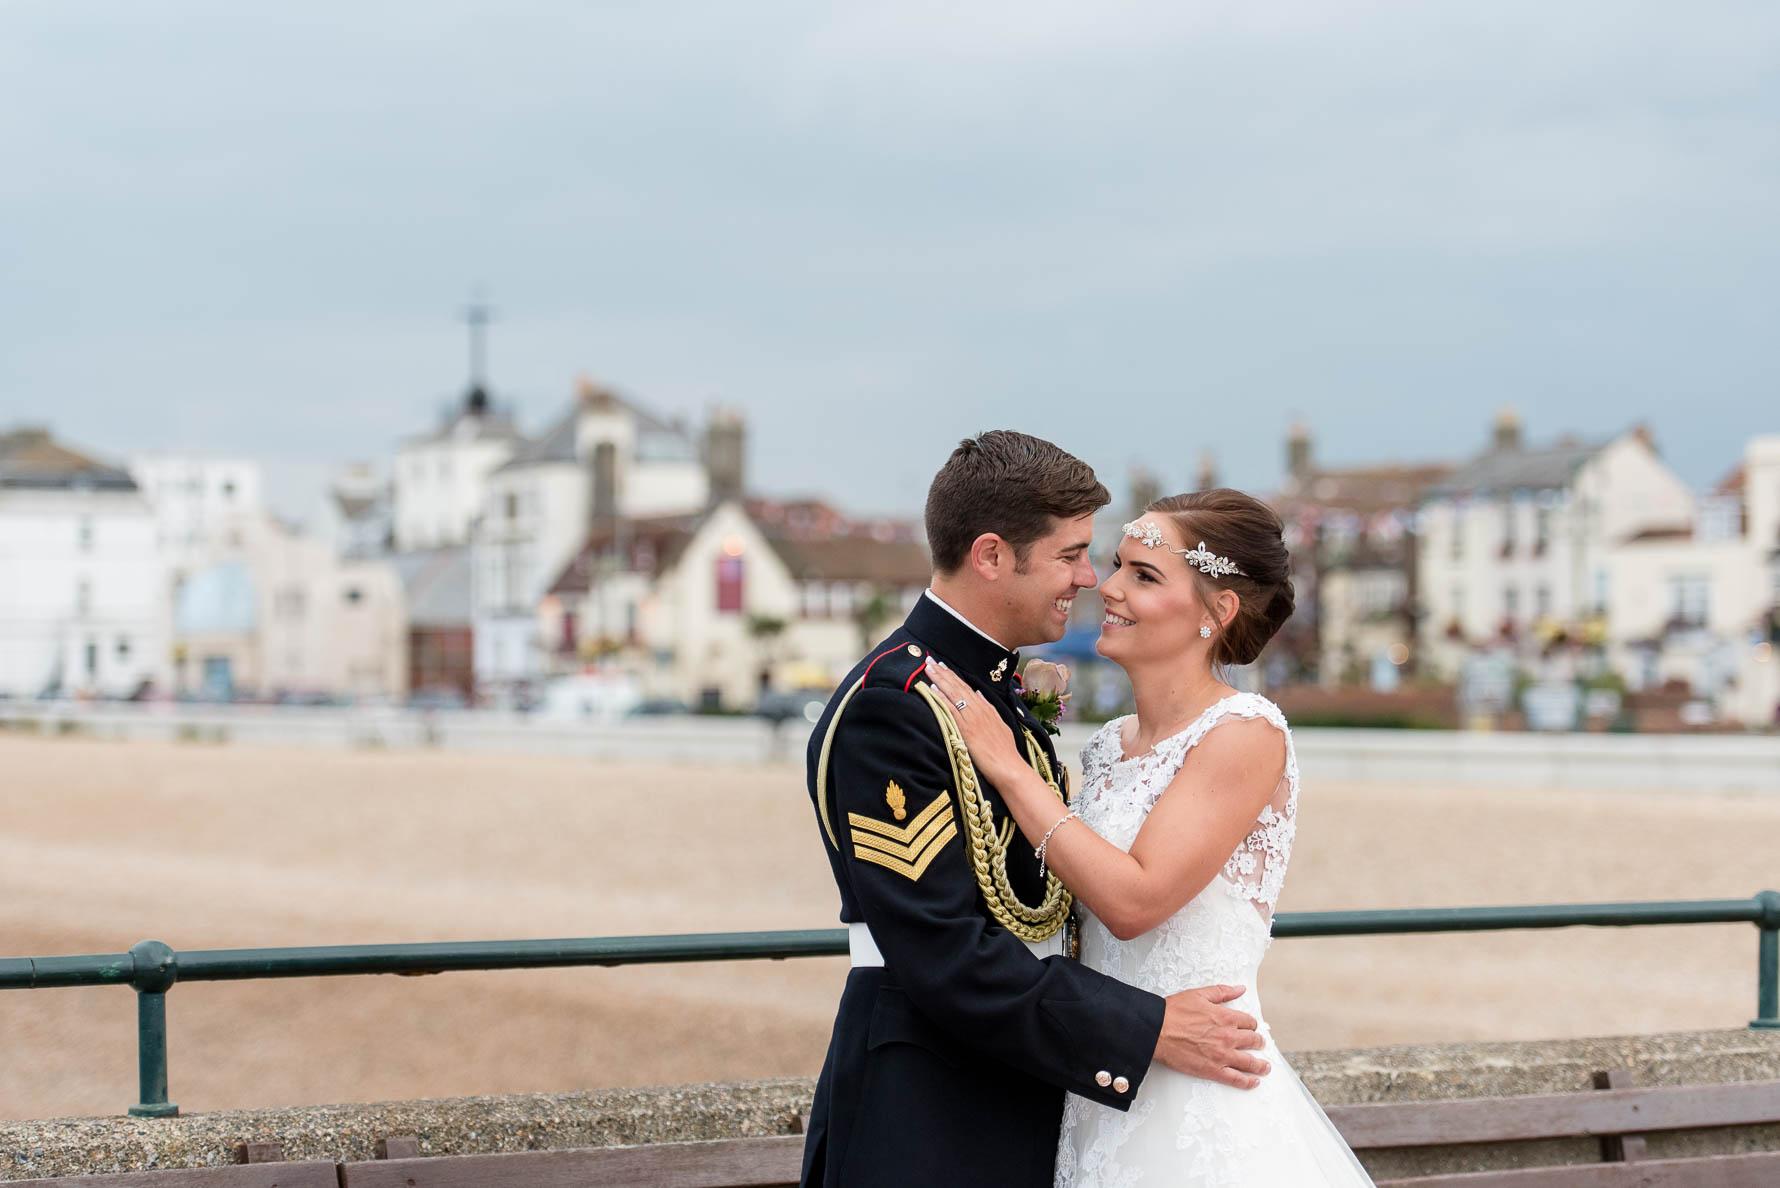 Wedding in Deal-8.jpg